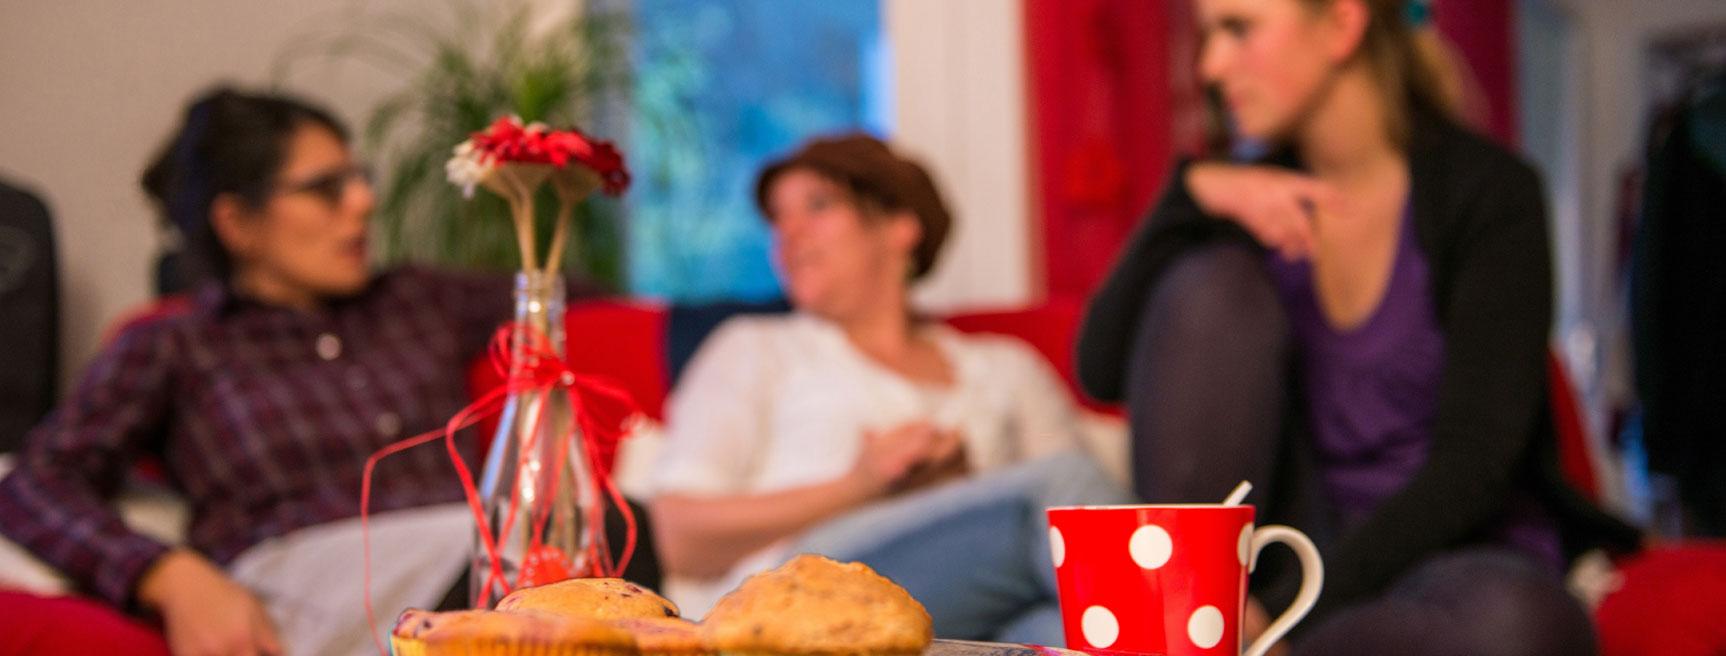 home_wg-lebensschule-gemeinschaft-formt-persoenlichkeit-casa-immanuel